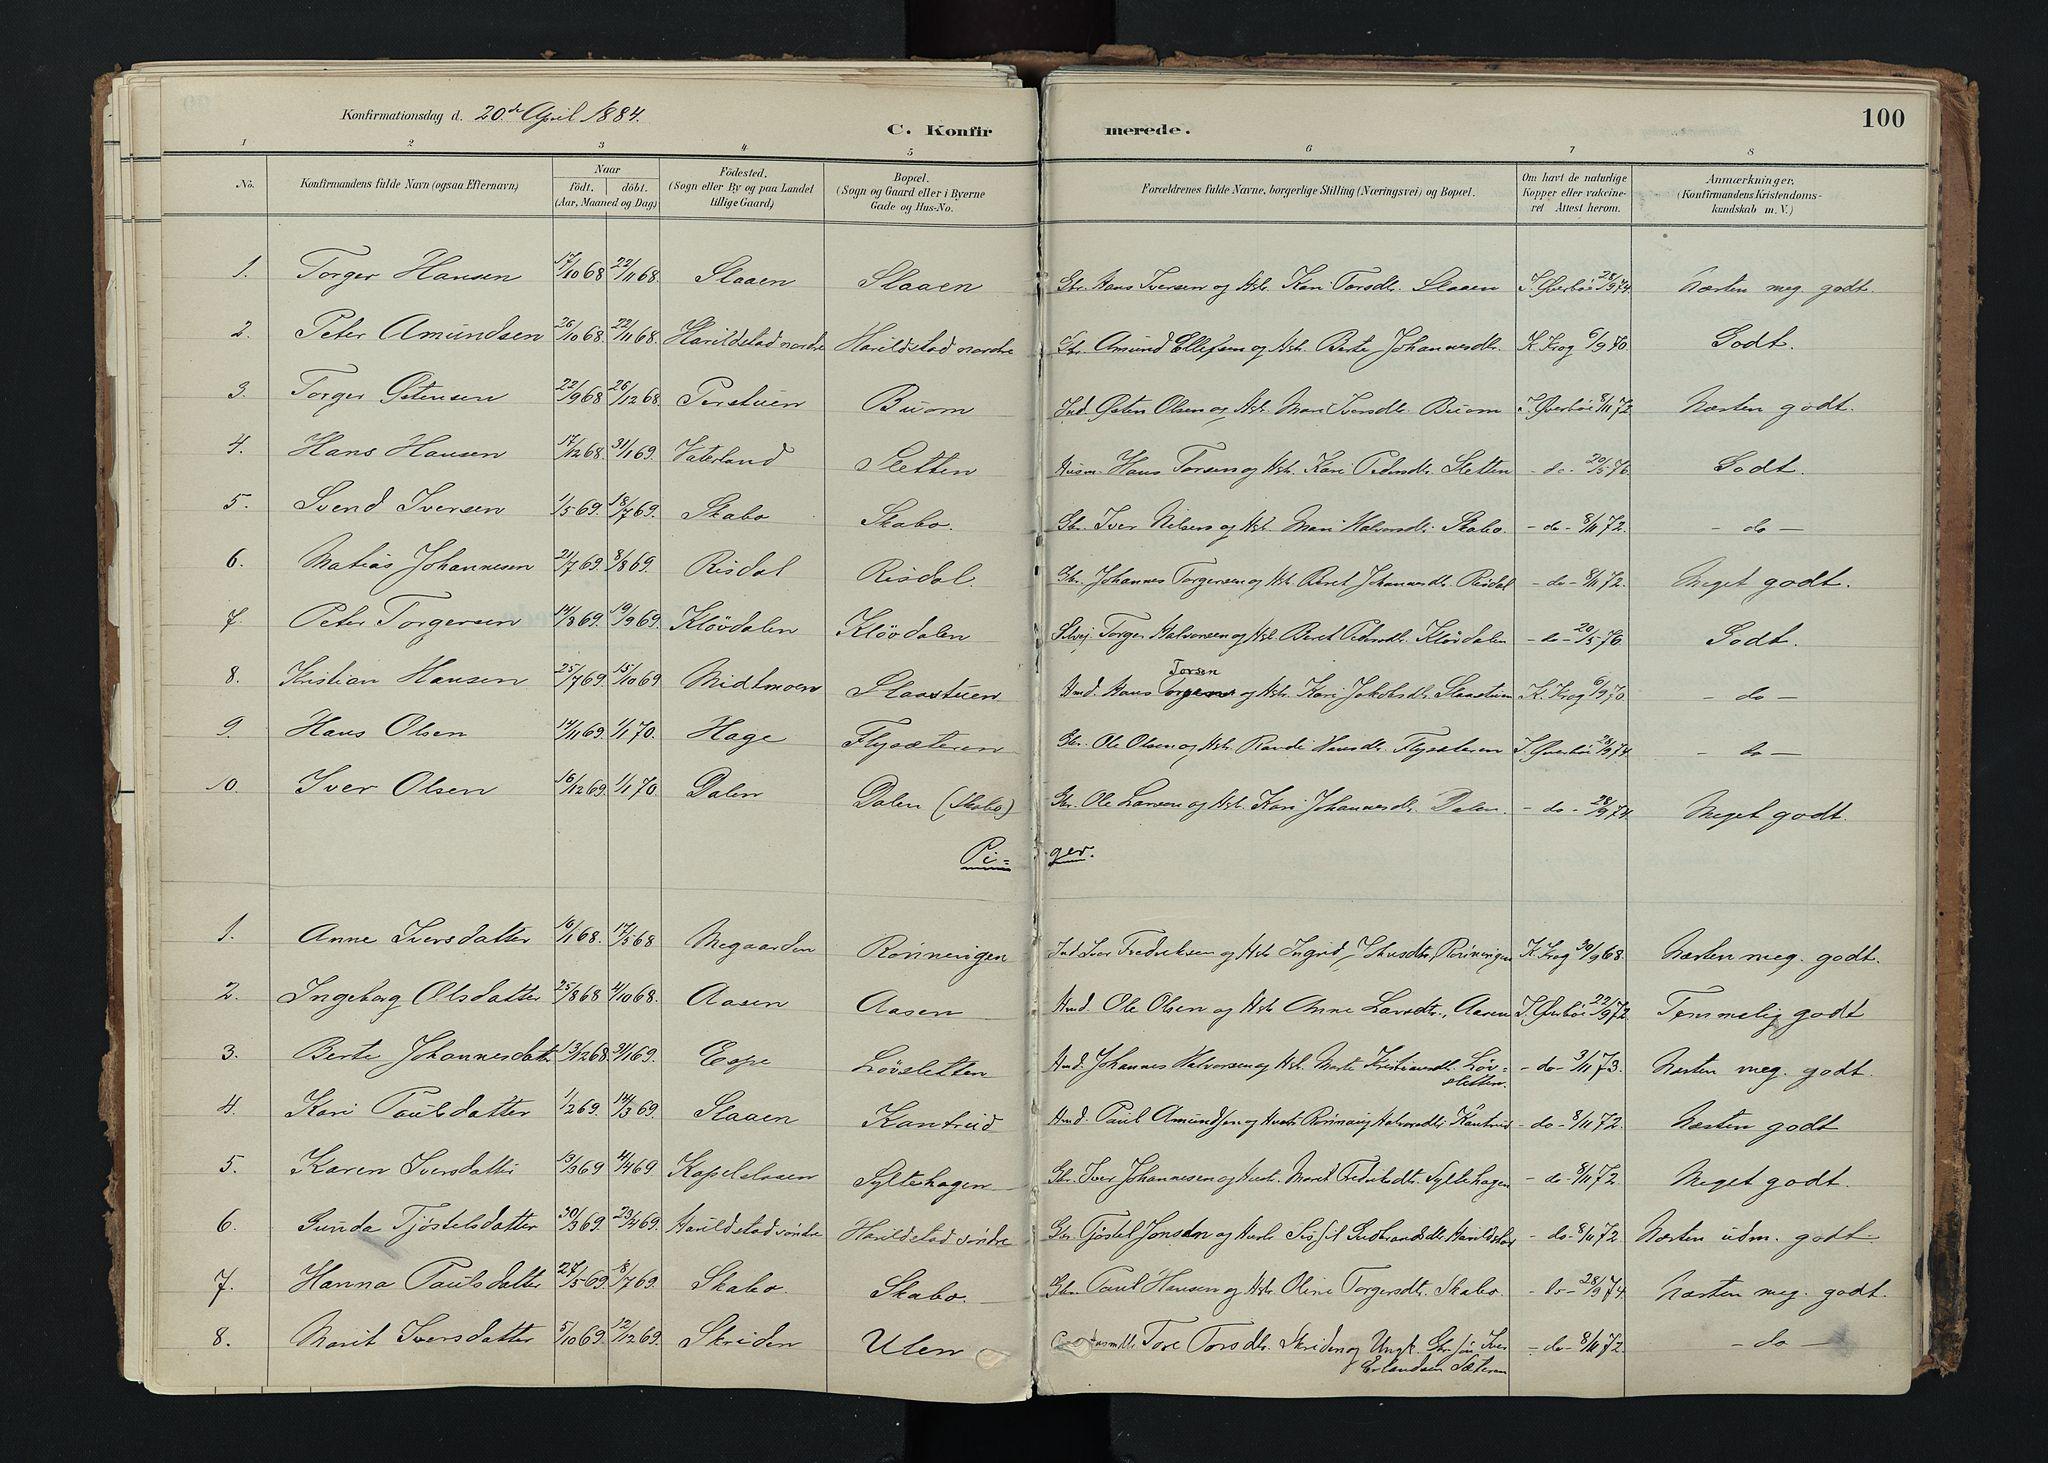 SAH, Nord-Fron prestekontor, Ministerialbok nr. 5, 1884-1914, s. 100